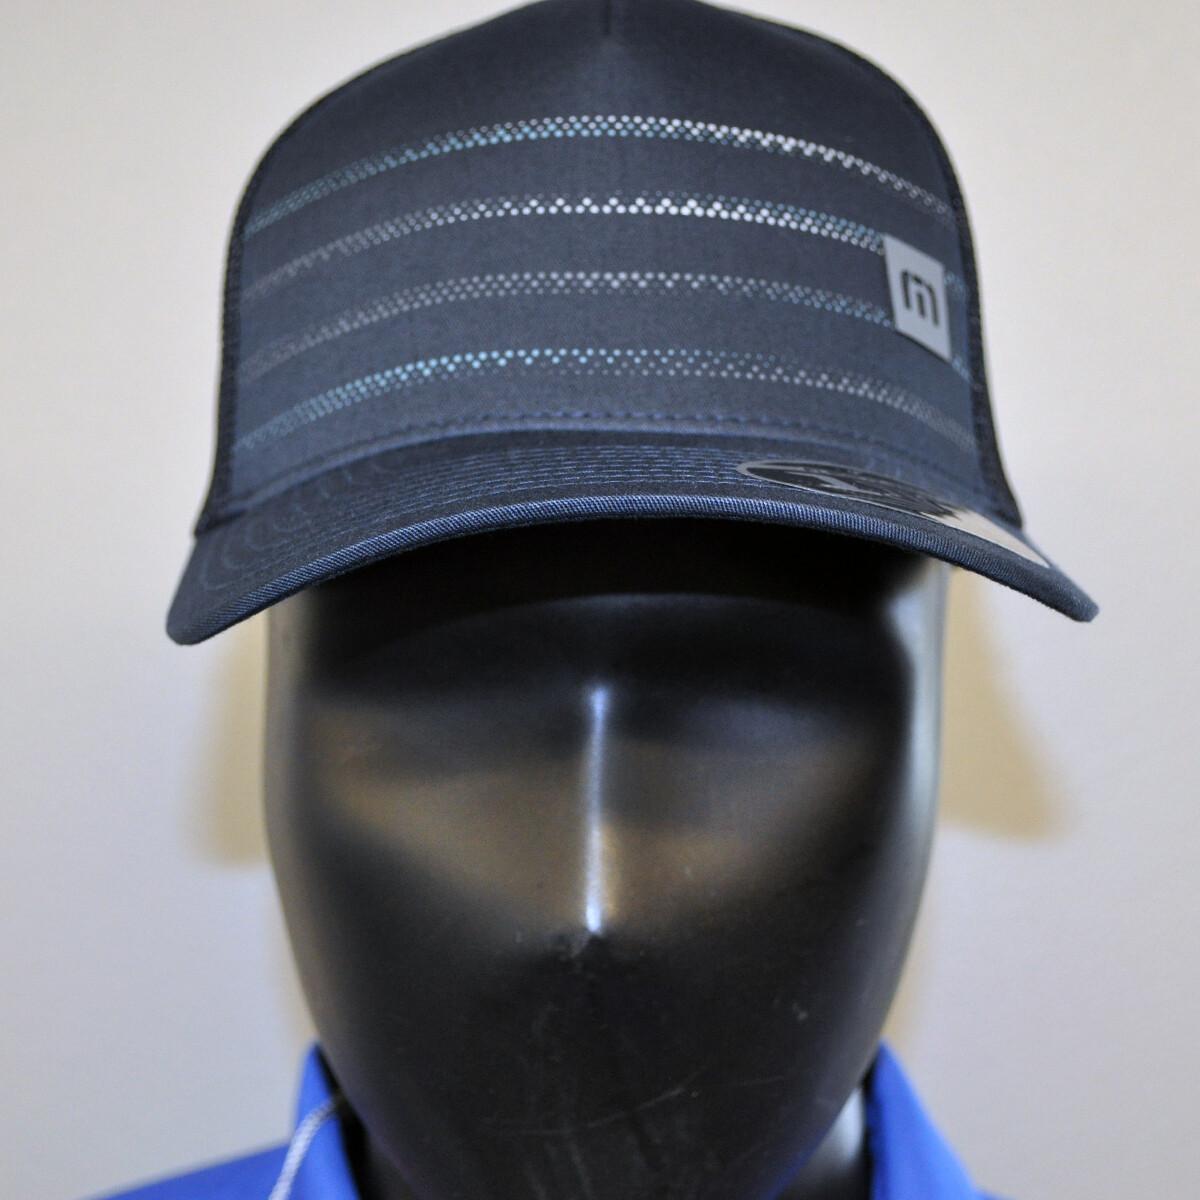 Men's Golf Hat - Travis Mathew - OSFA Navy